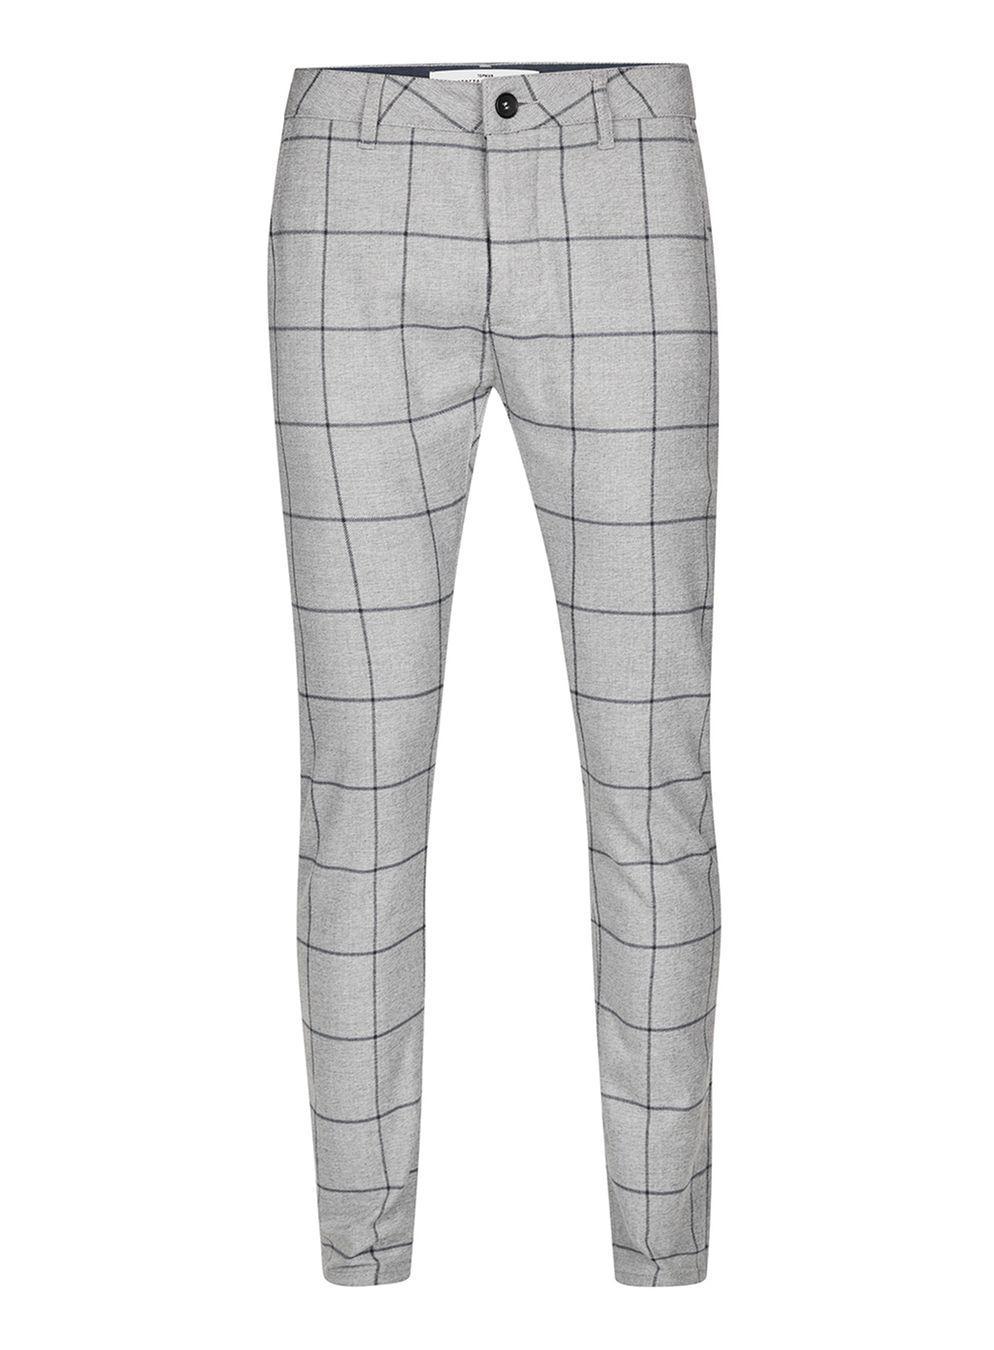 ec3d632a14 TOPMAN Grey Check Stretch Skinny Trouser in Gray for Men - Lyst